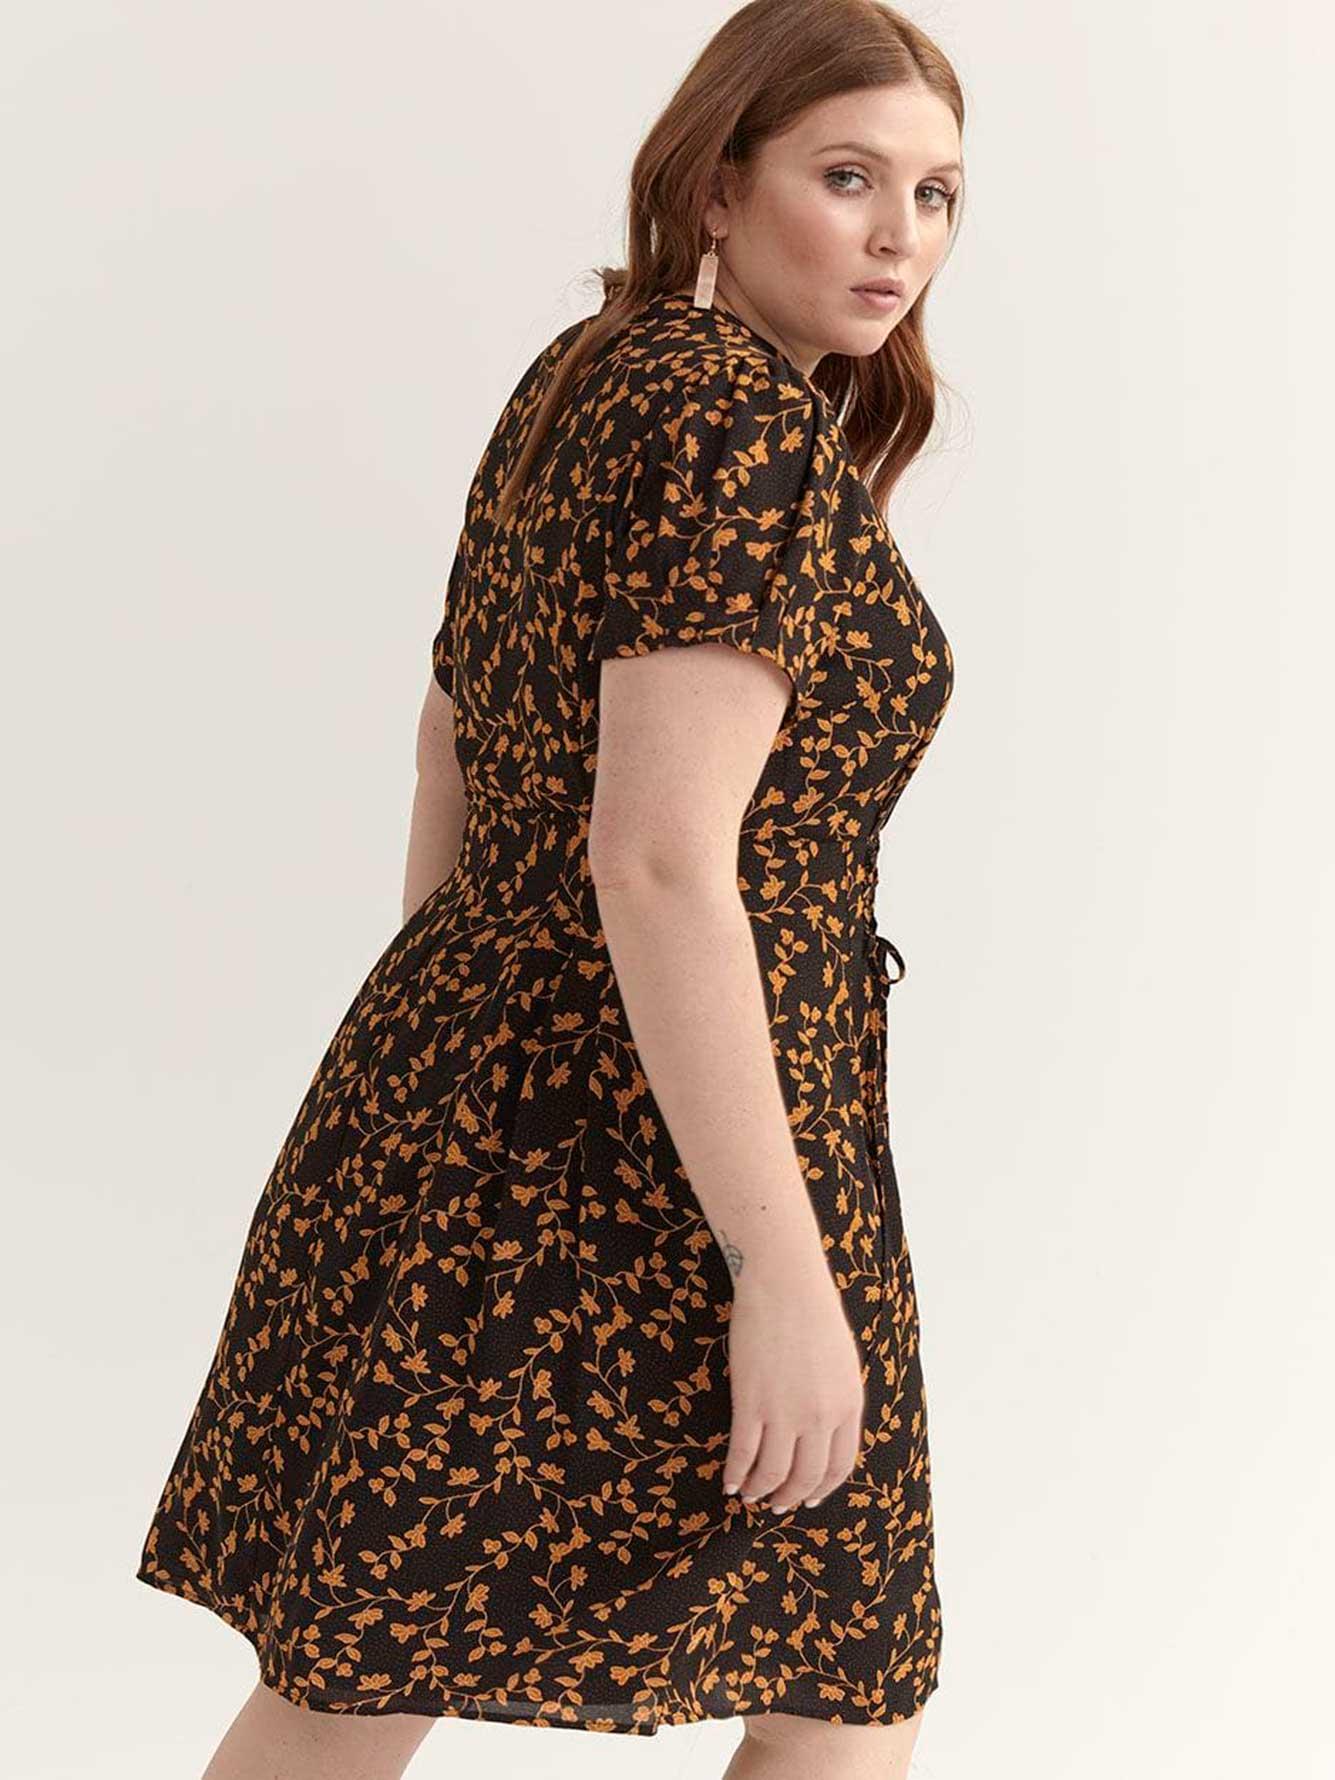 d2e92ec15 Floral Fit & Flare Short-Sleeve Dress - City Chic   Addition Elle